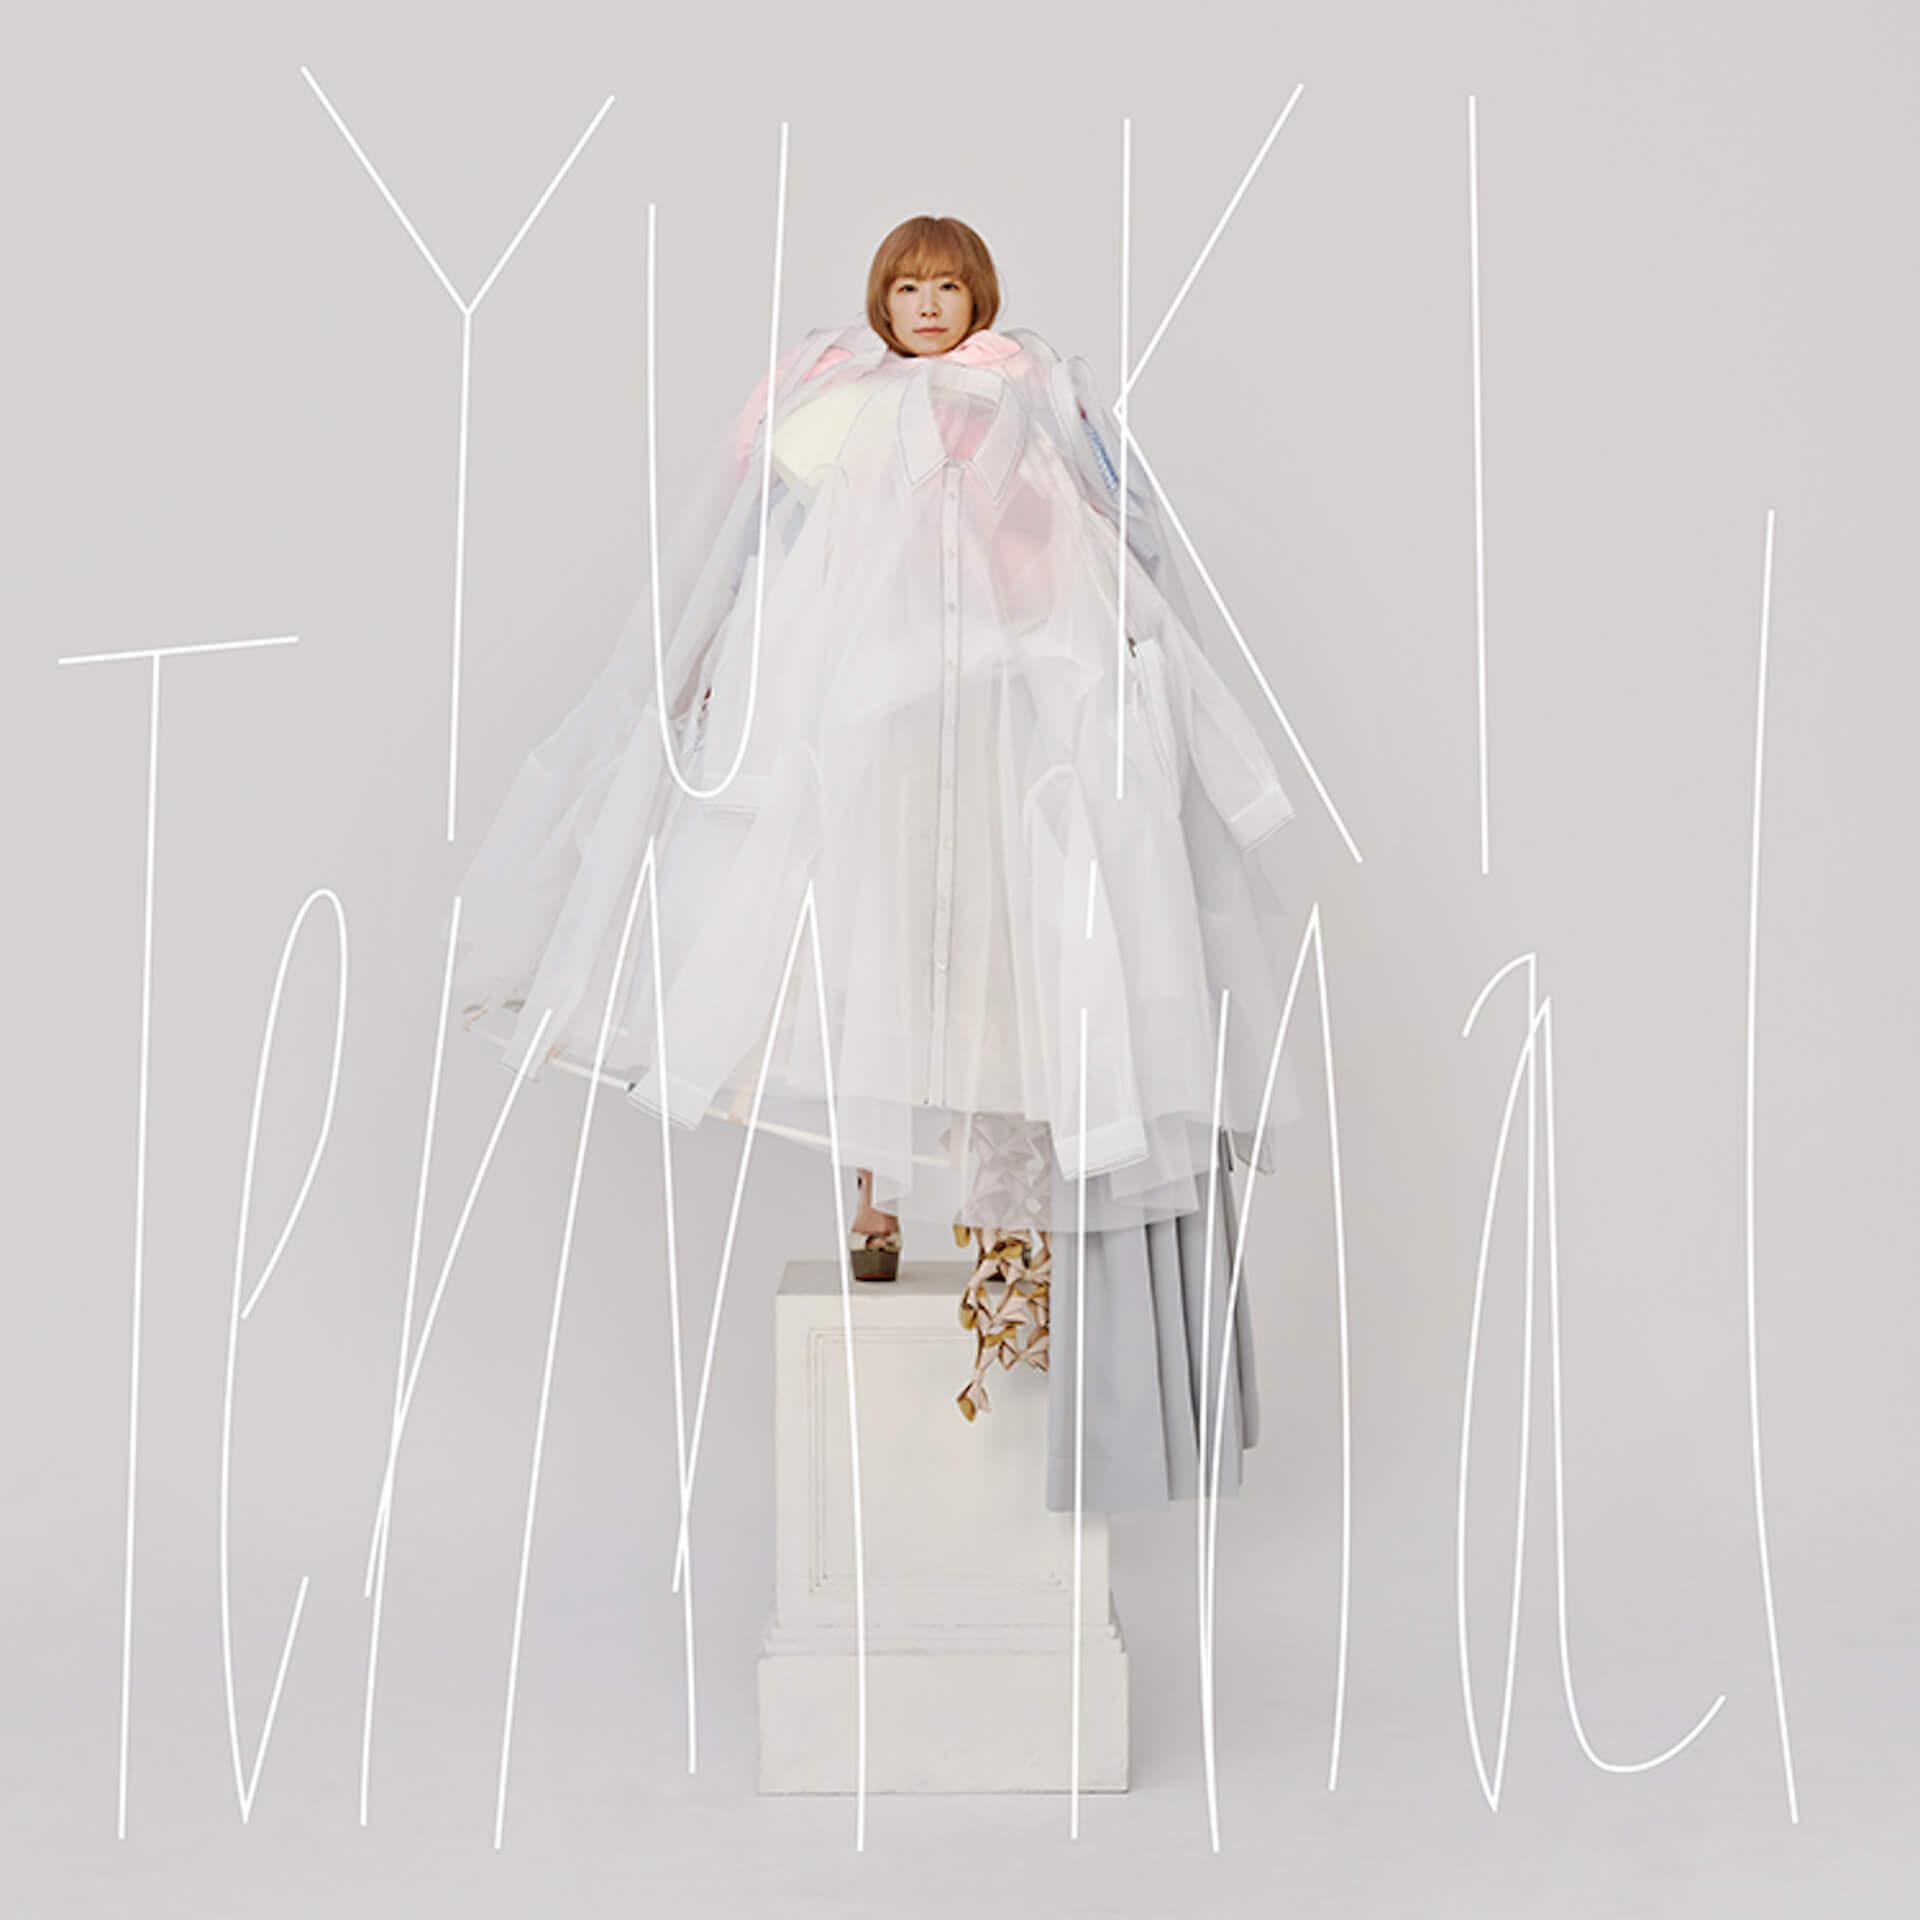 "YUKIのニューアルバム『Terminal』収録""My lovely ghost""のMVティザー映像が解禁!ラジオ出演も決定 music210415_yuki_5"